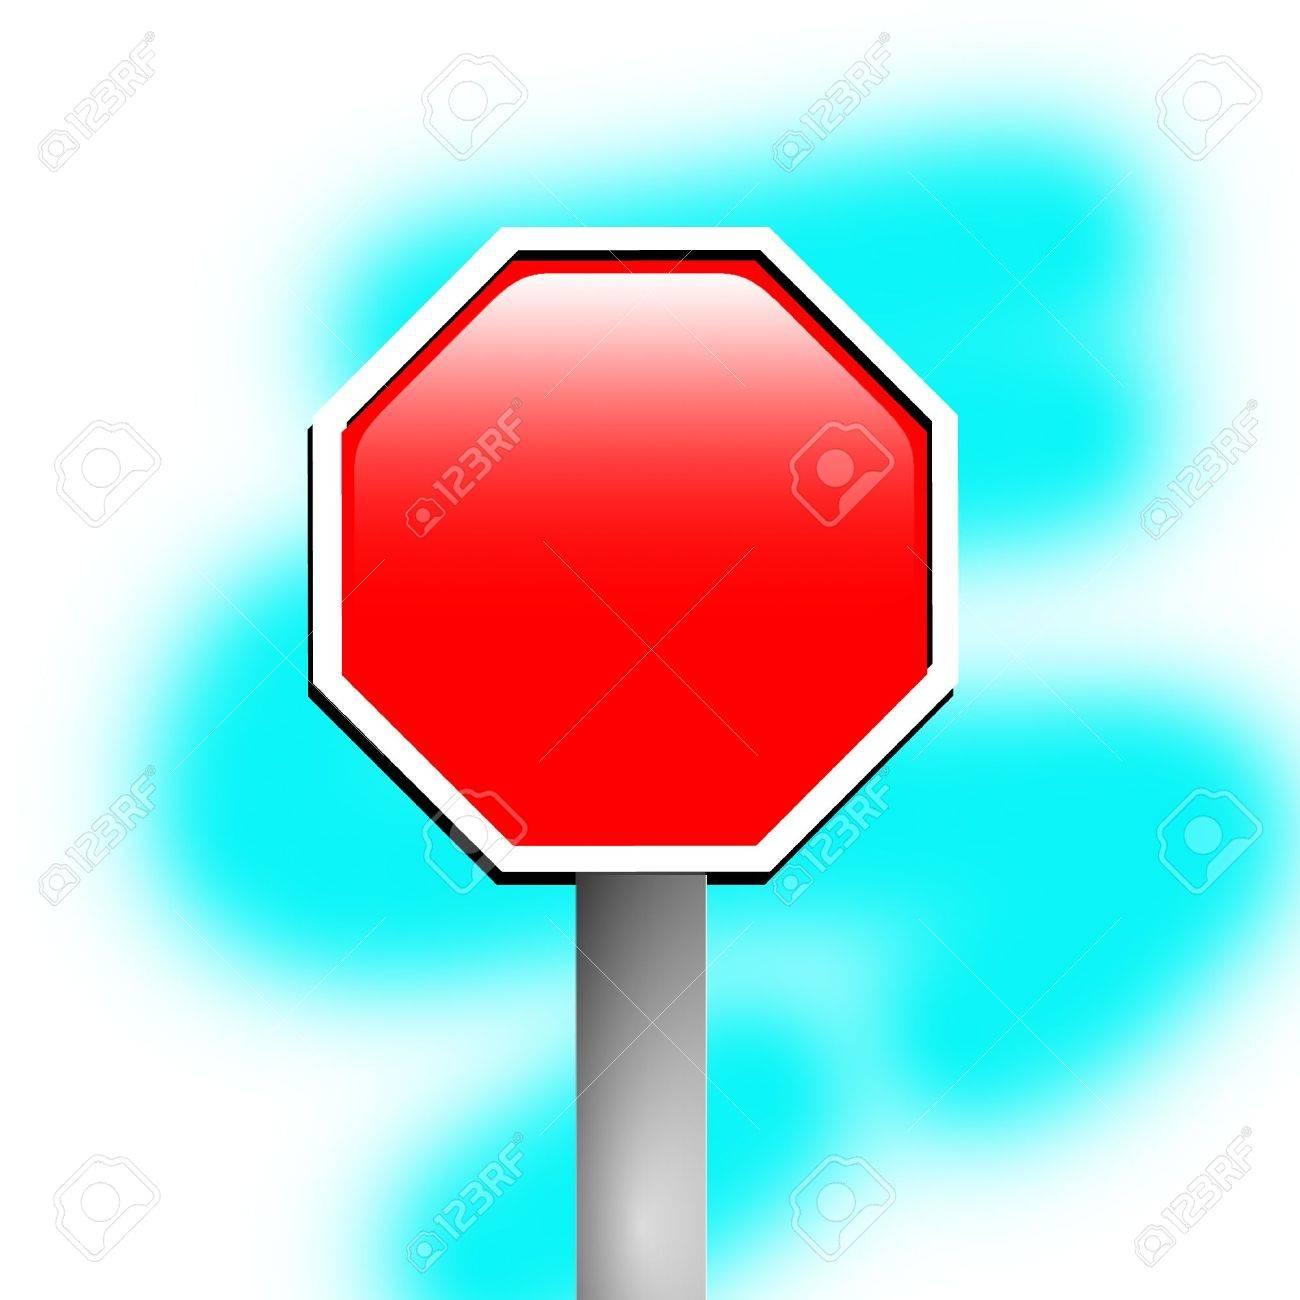 Blank stop sign frame against blue background